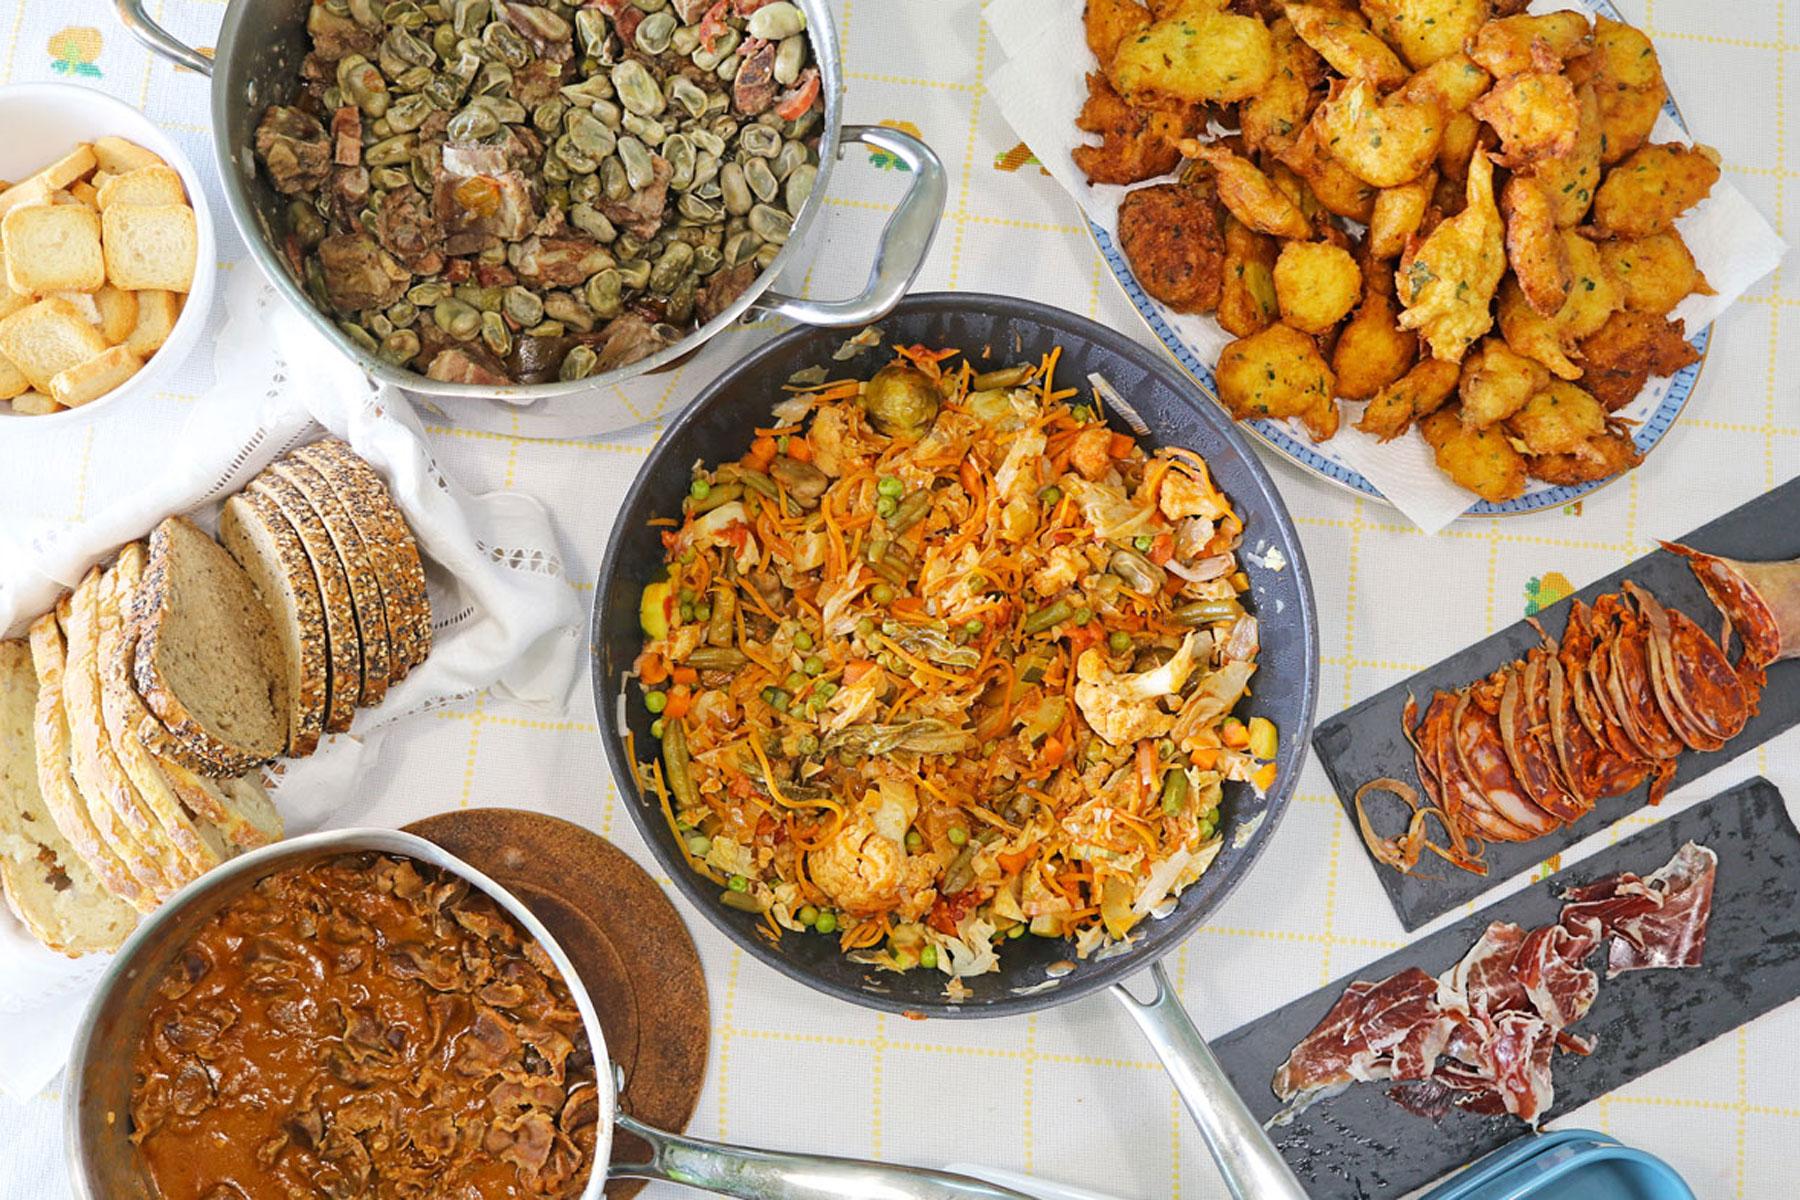 Food spread web